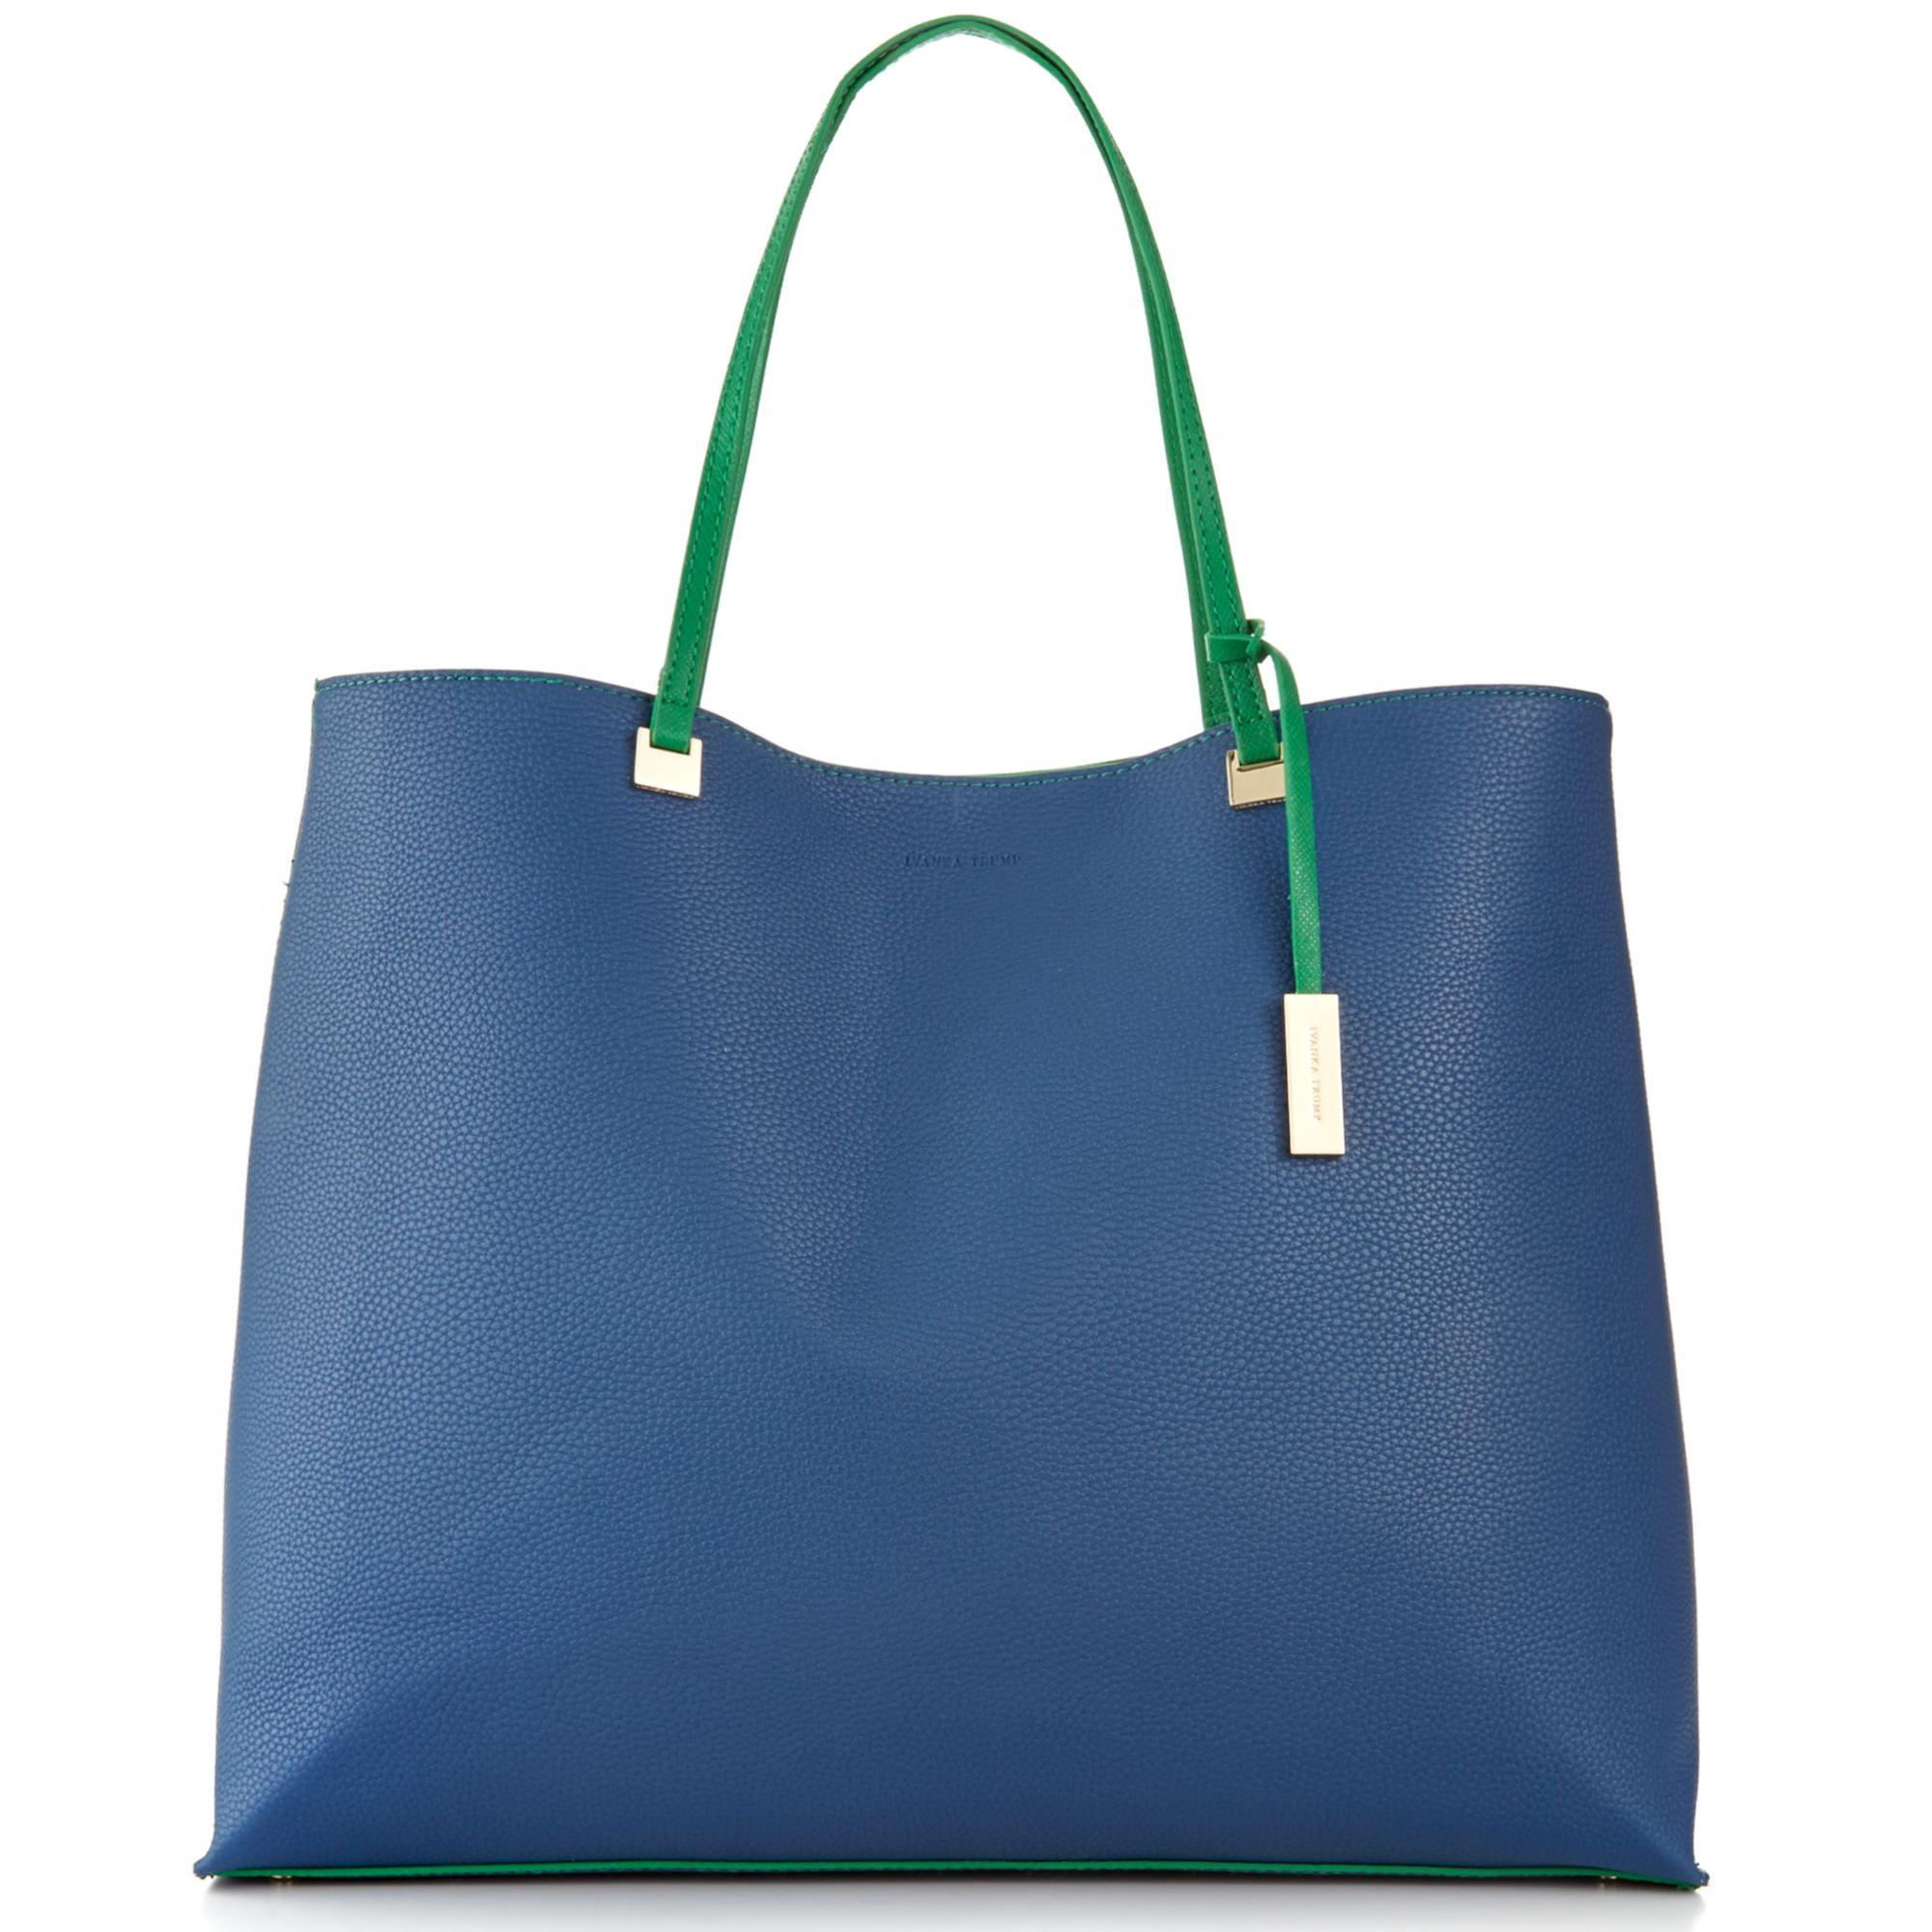 Ivanka Trump Julia Shopper in Blue (Navy Colorblock)